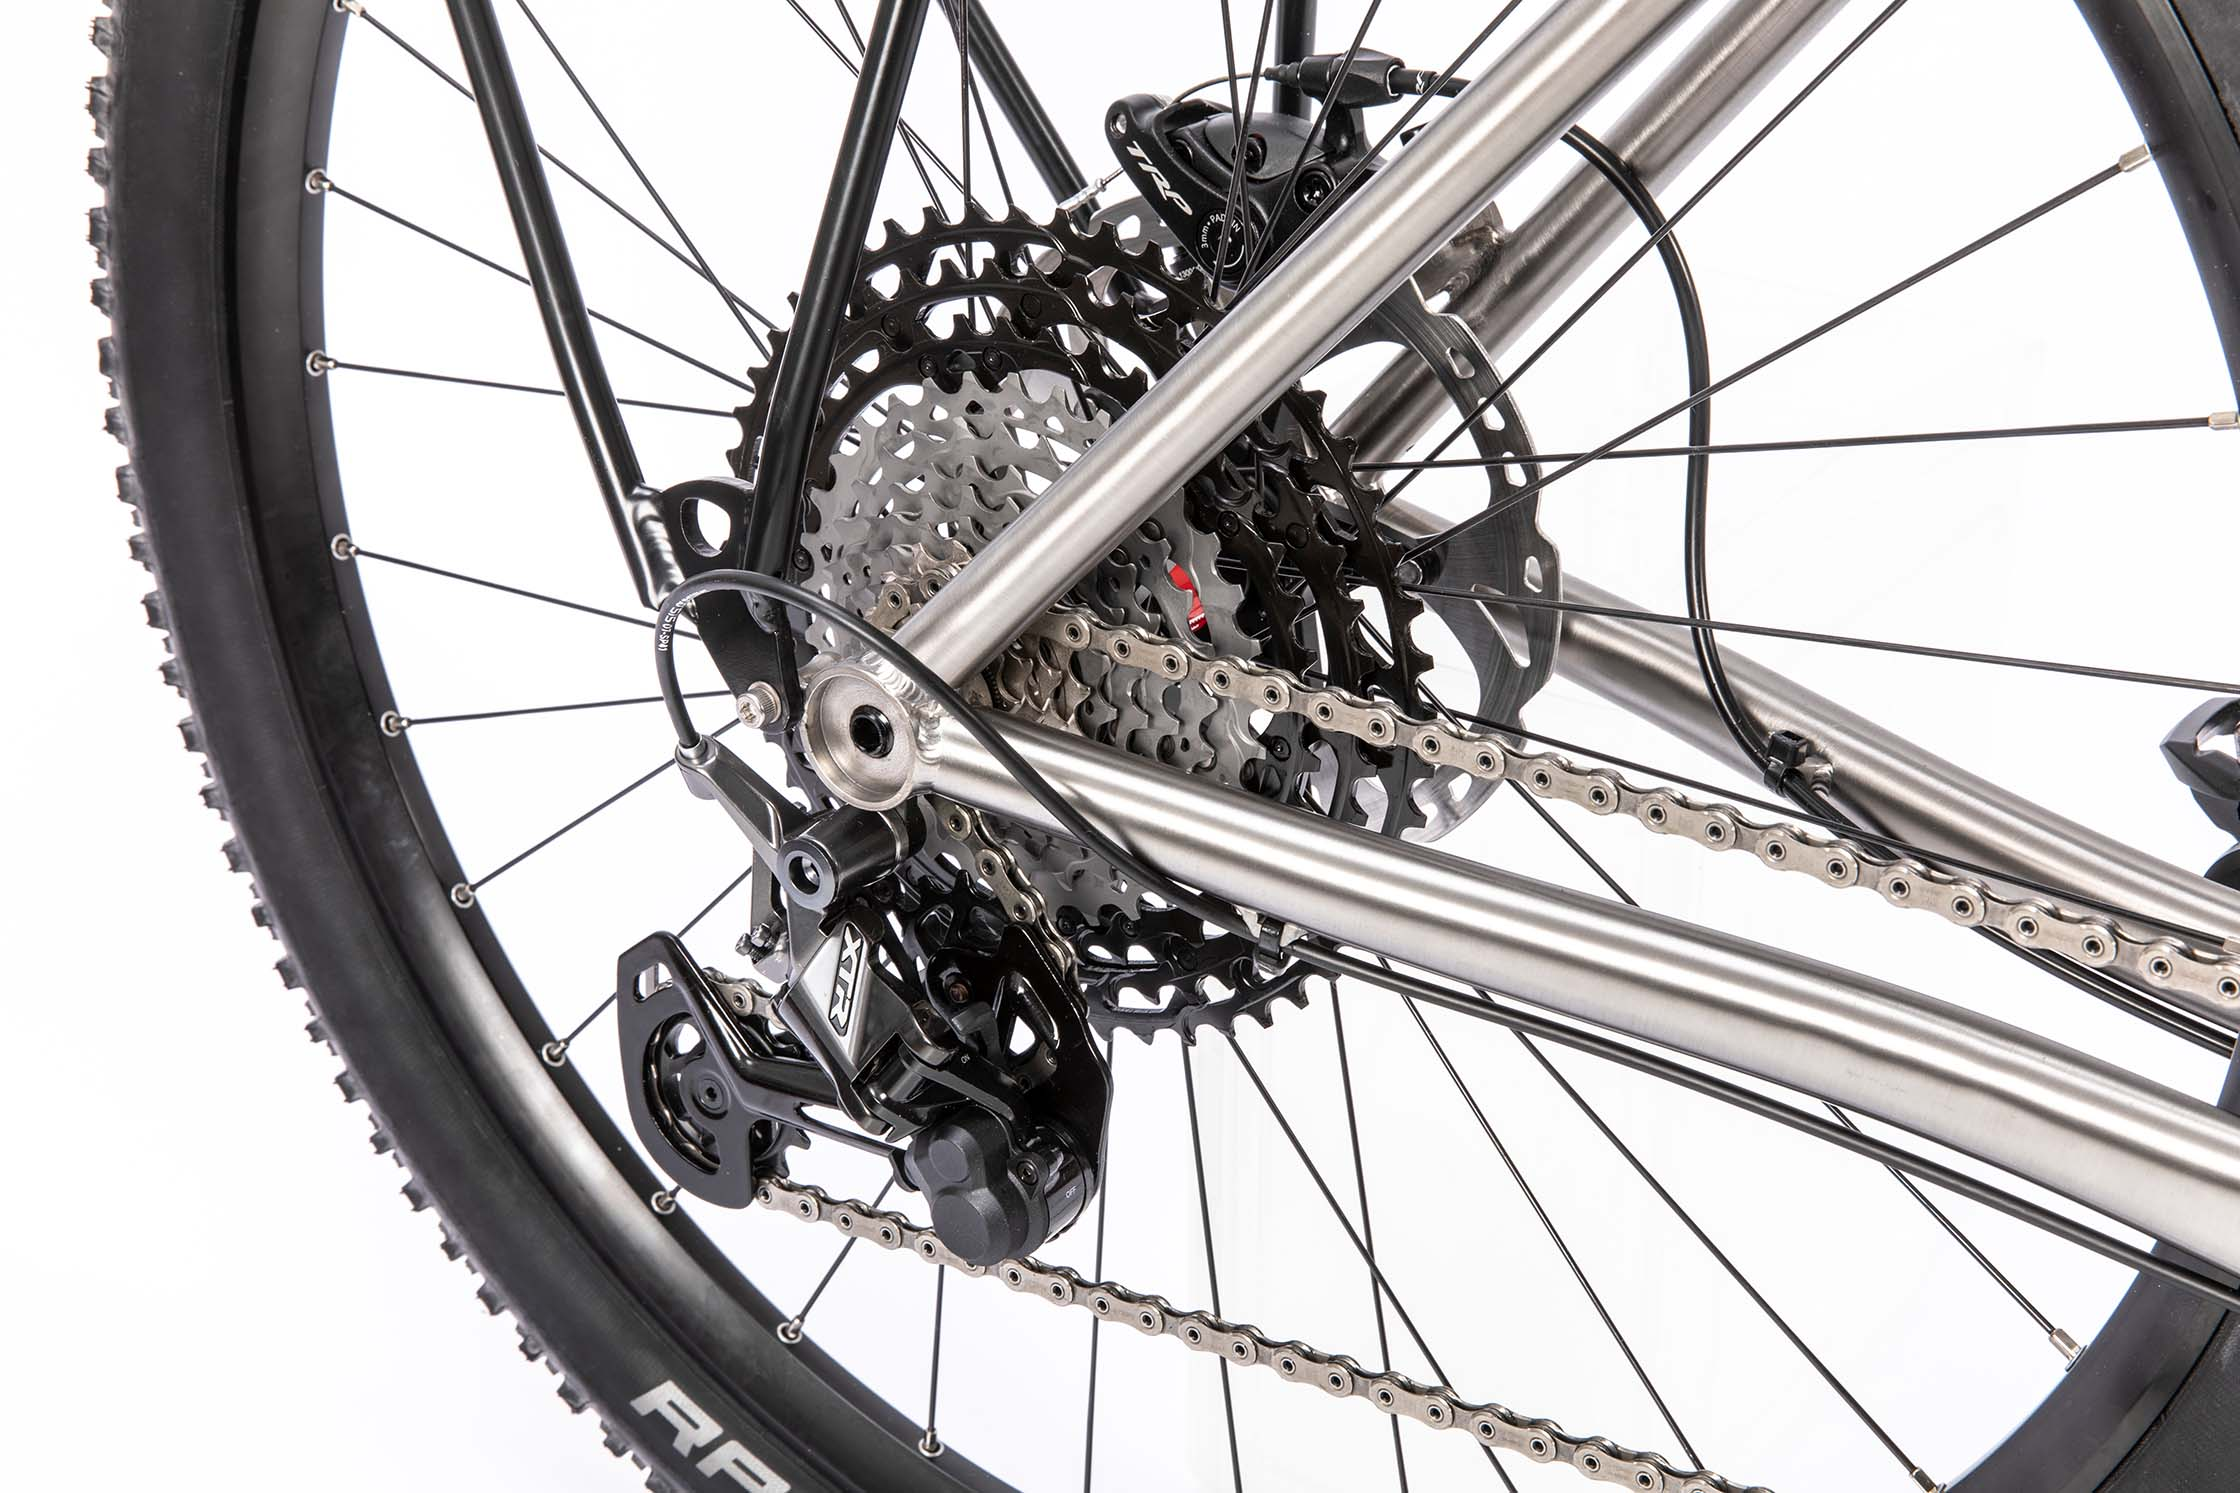 Mass Titan Mountainbike Hardtail für Bike Adventure Touren_5